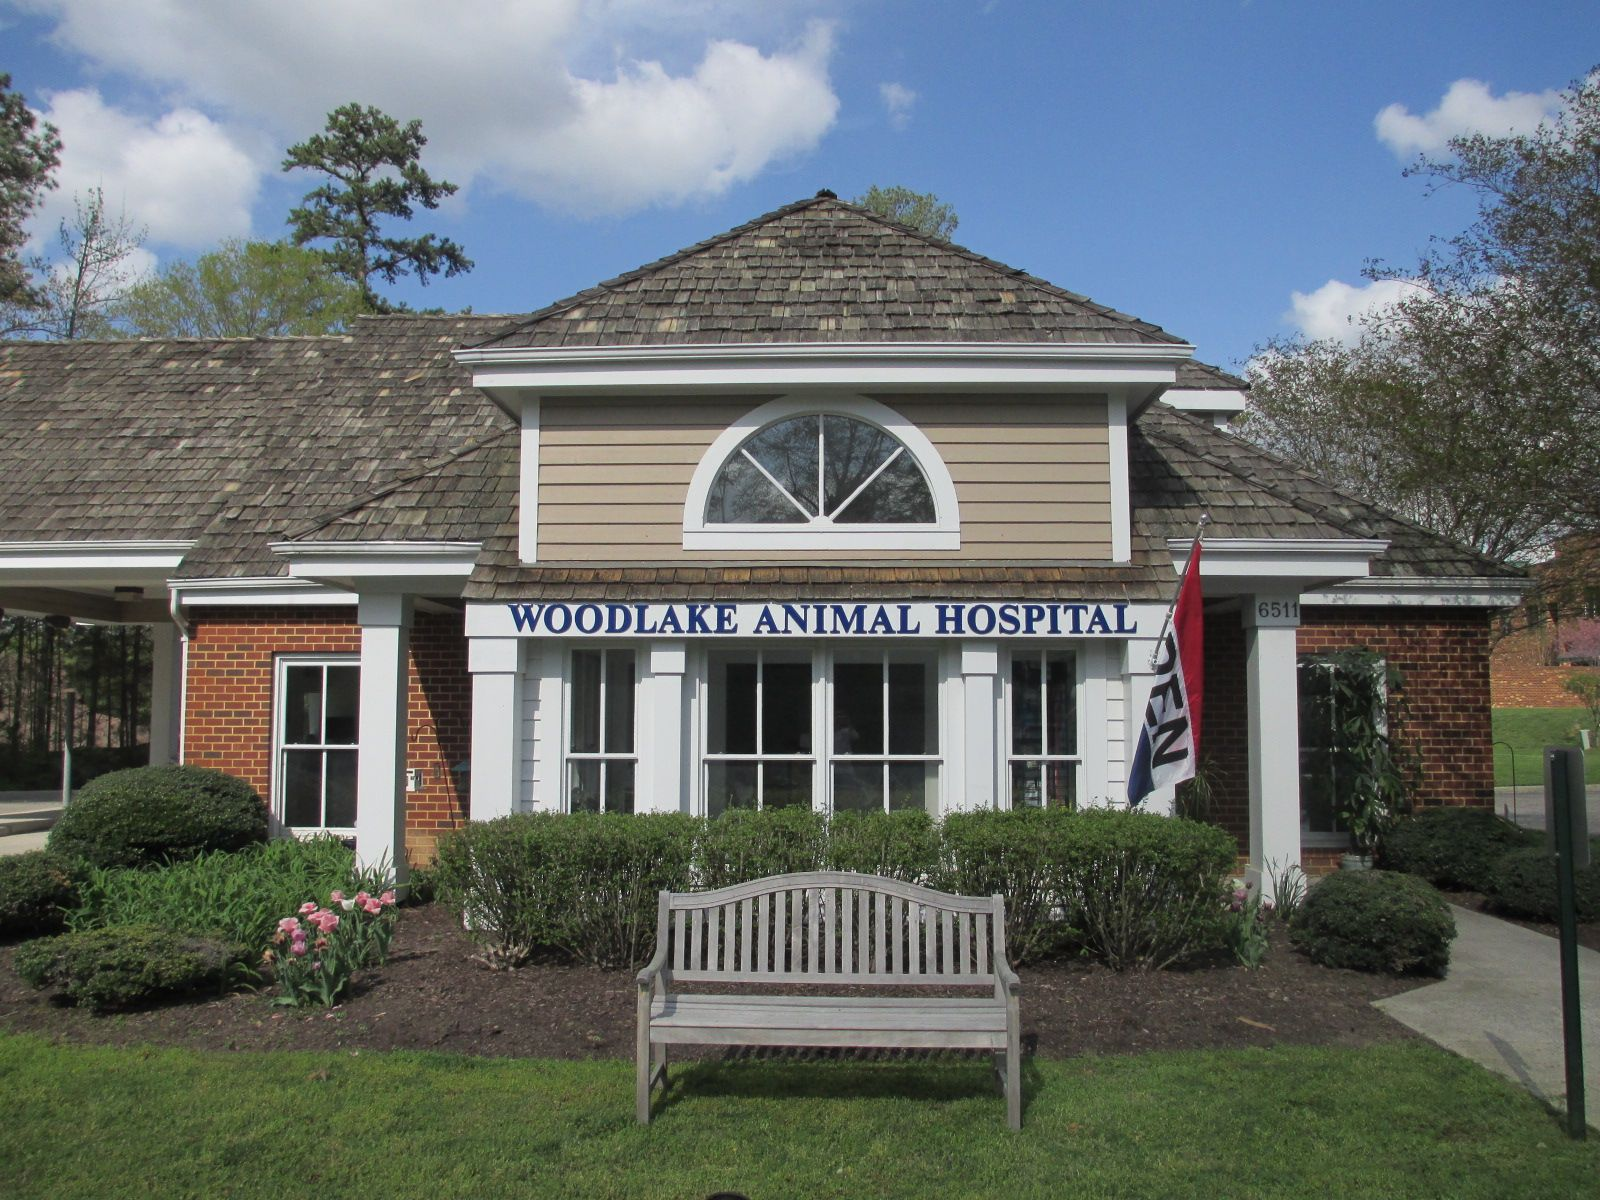 to Woodlake Animal Hospital Animal hospital